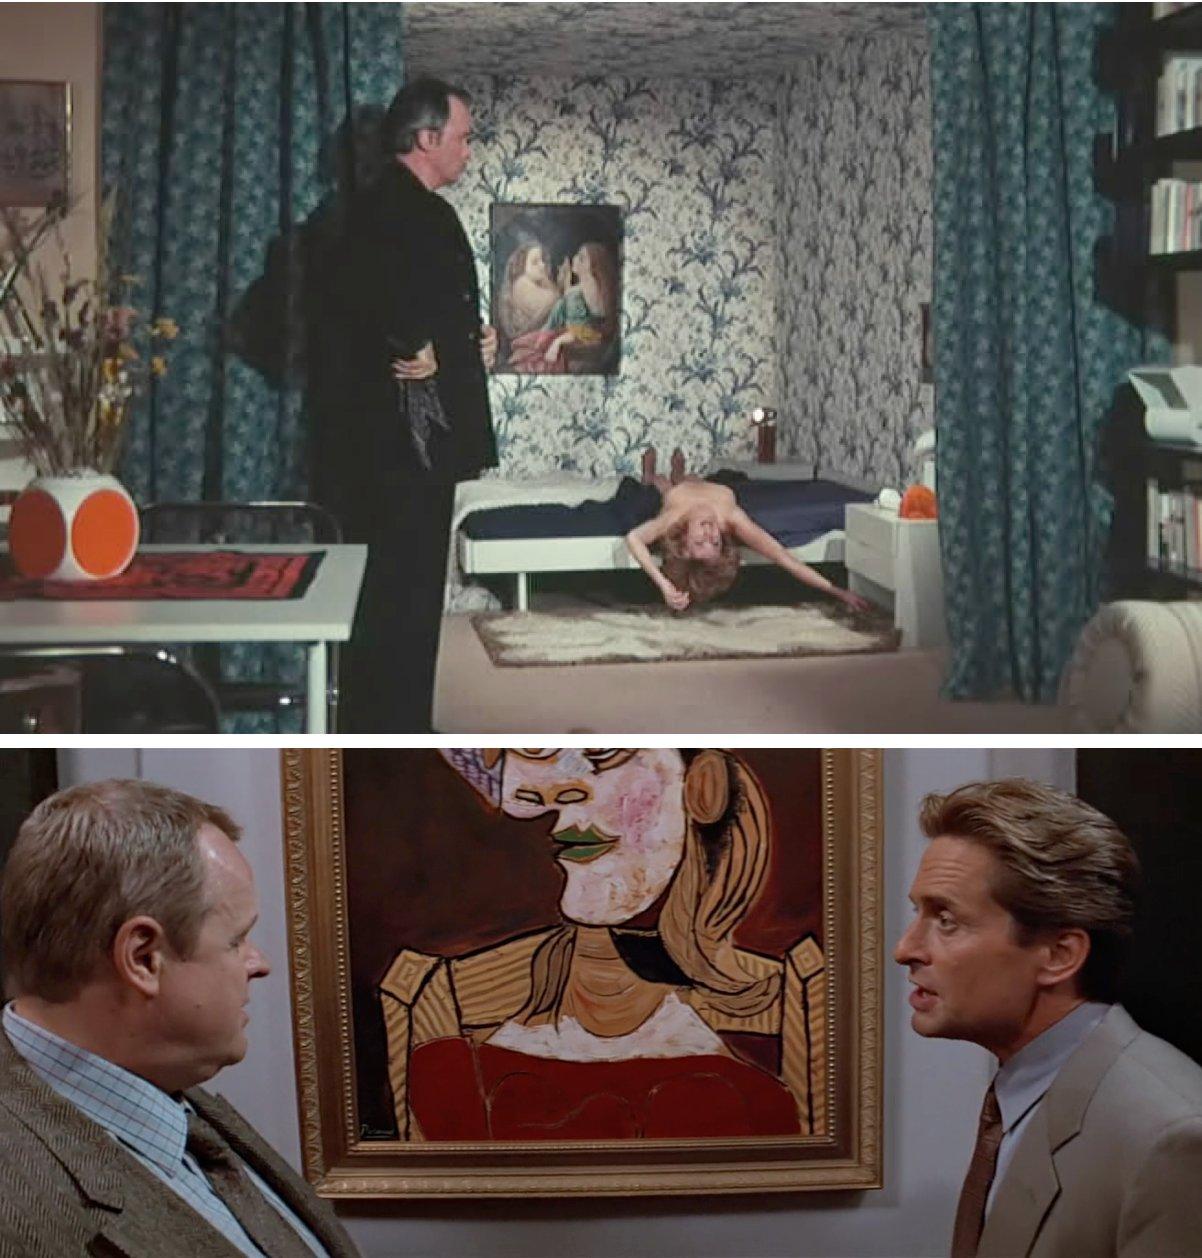 Juste avant la nuit (Claude Chabrol, 1971) / Basic Instinct (Paul Verhoeven, 1992).